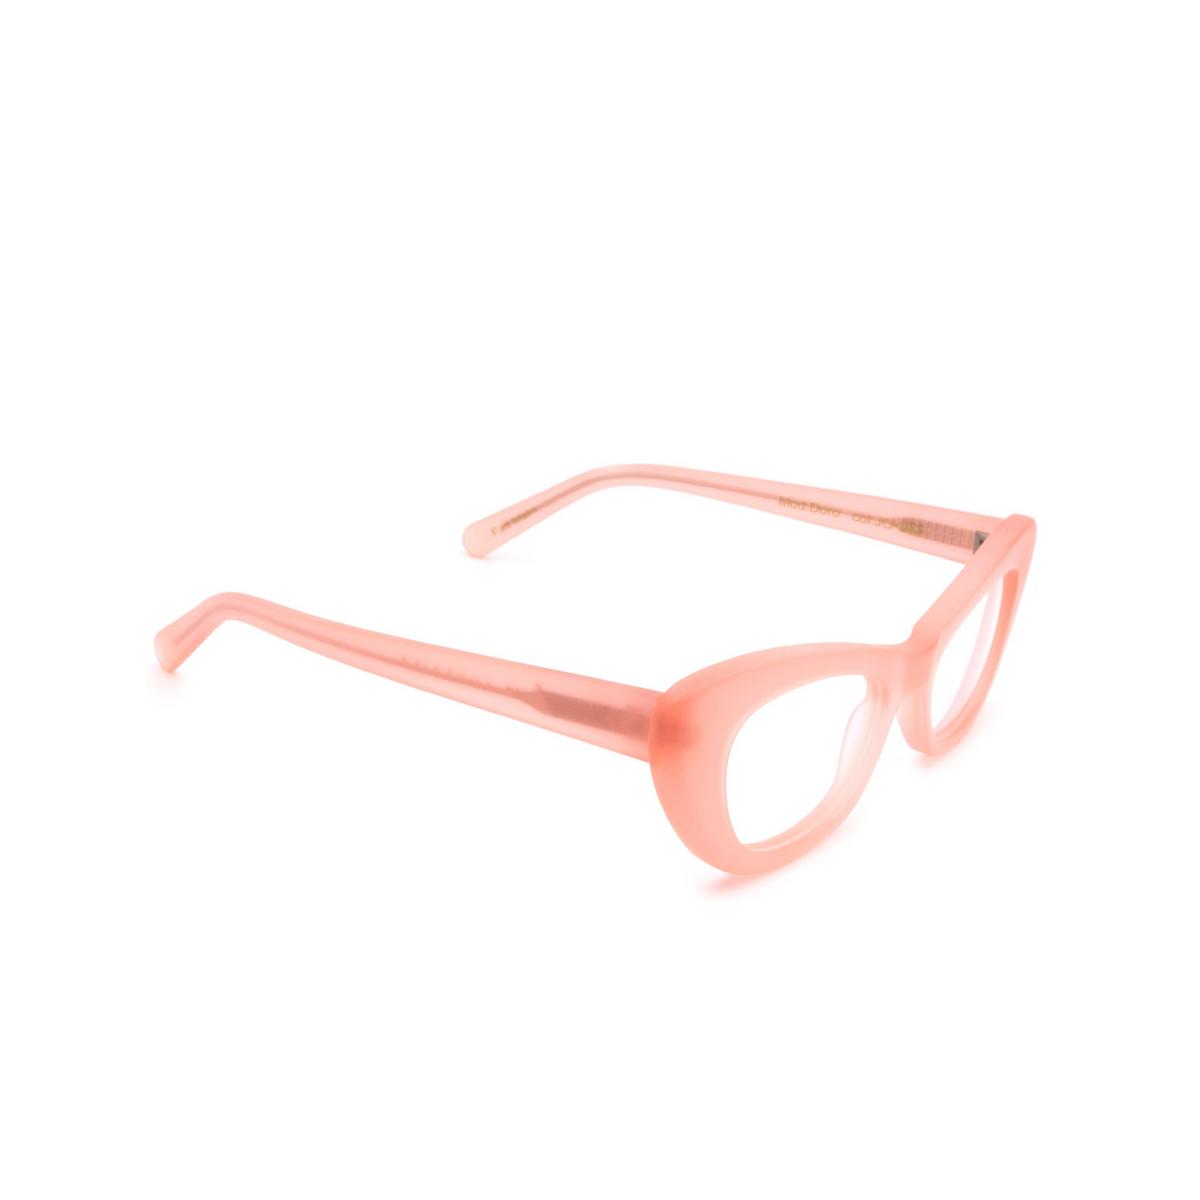 Lesca® Cat-eye Eyeglasses: Doro Optic color Rose JO-2M - three-quarters view.